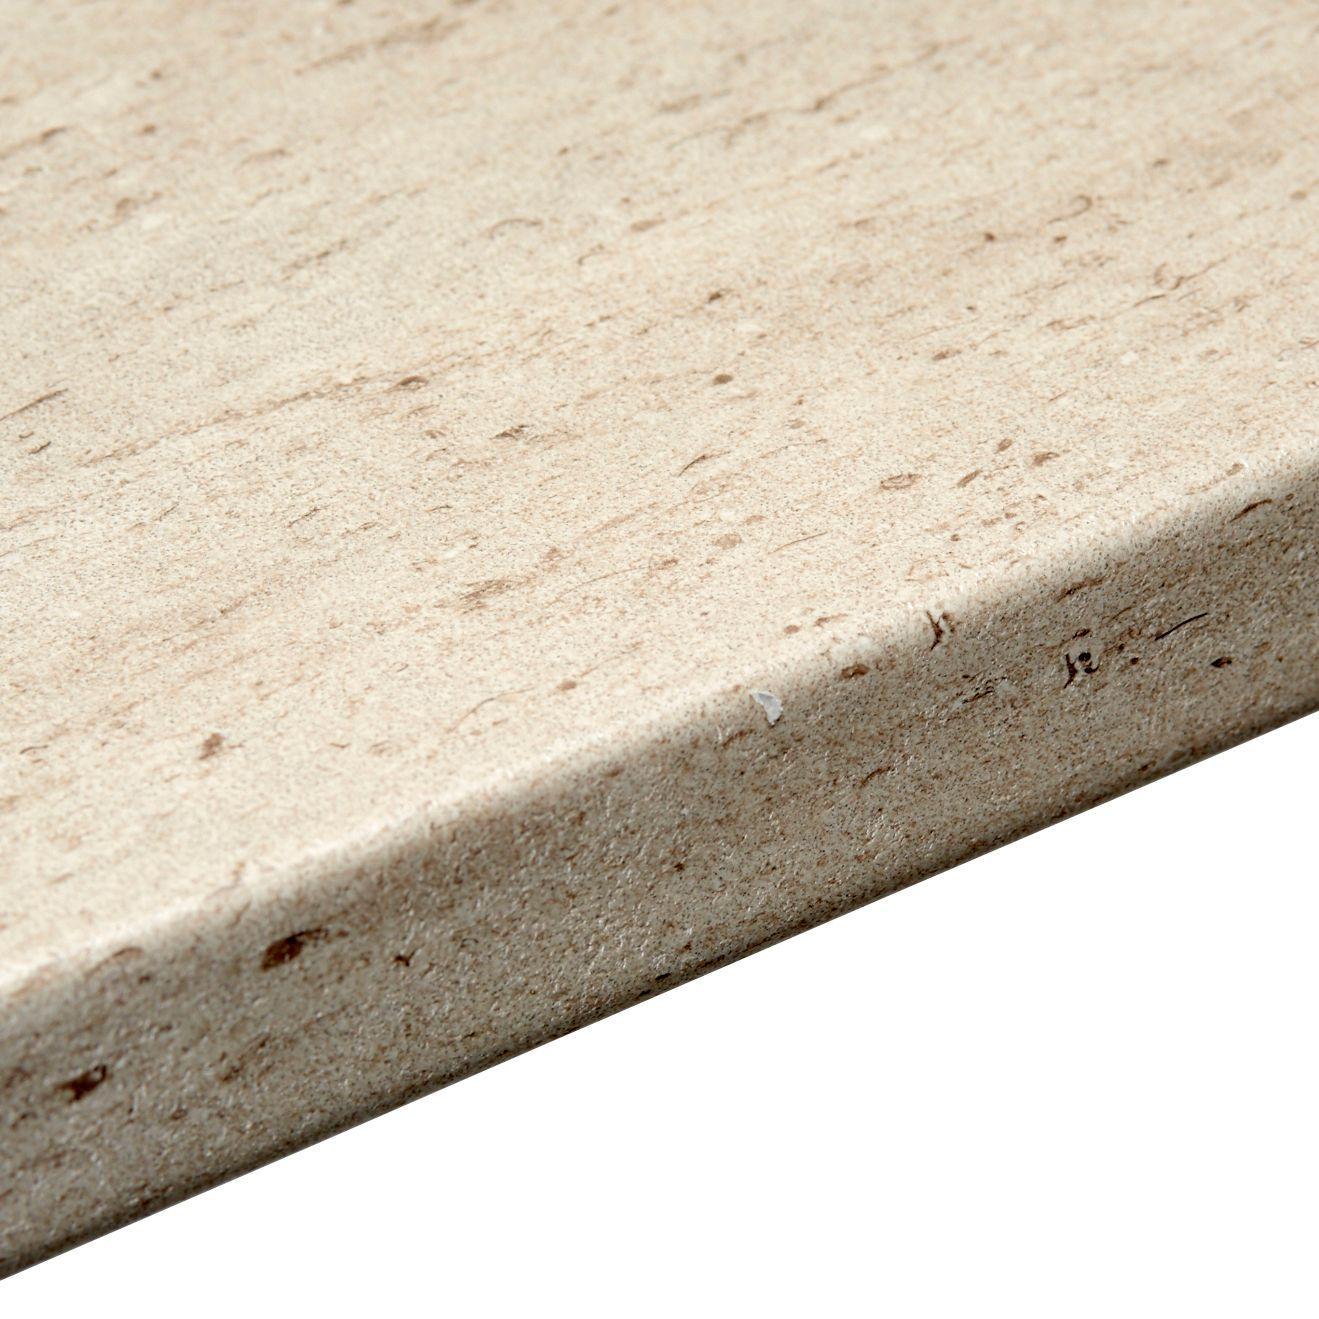 38mm b u0026q trieste stone laminate post formed 6mm kitchen worktop